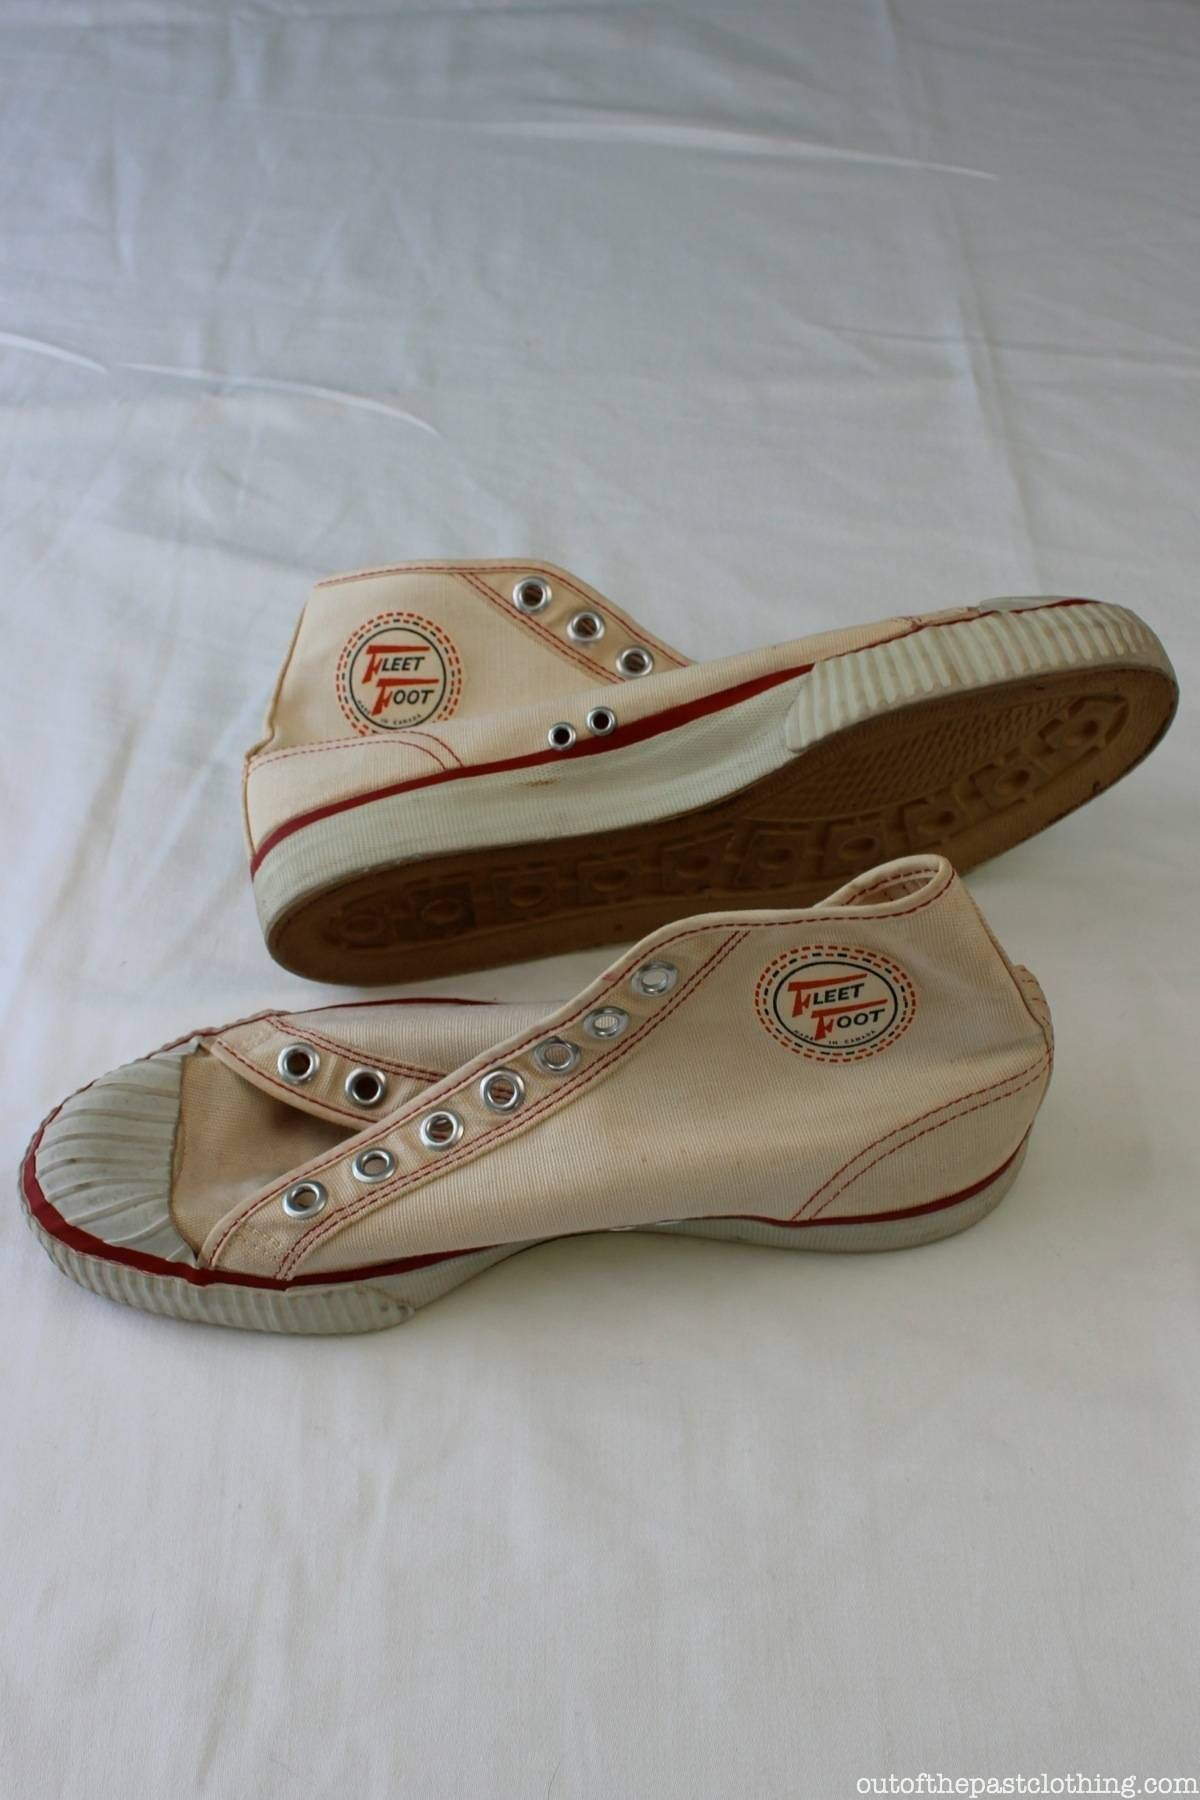 Fleet Foot Canadian Vintage 1940s High Top Canvas Shoes Fleet Feet Vintage Shoes Fleet Feet Shoes